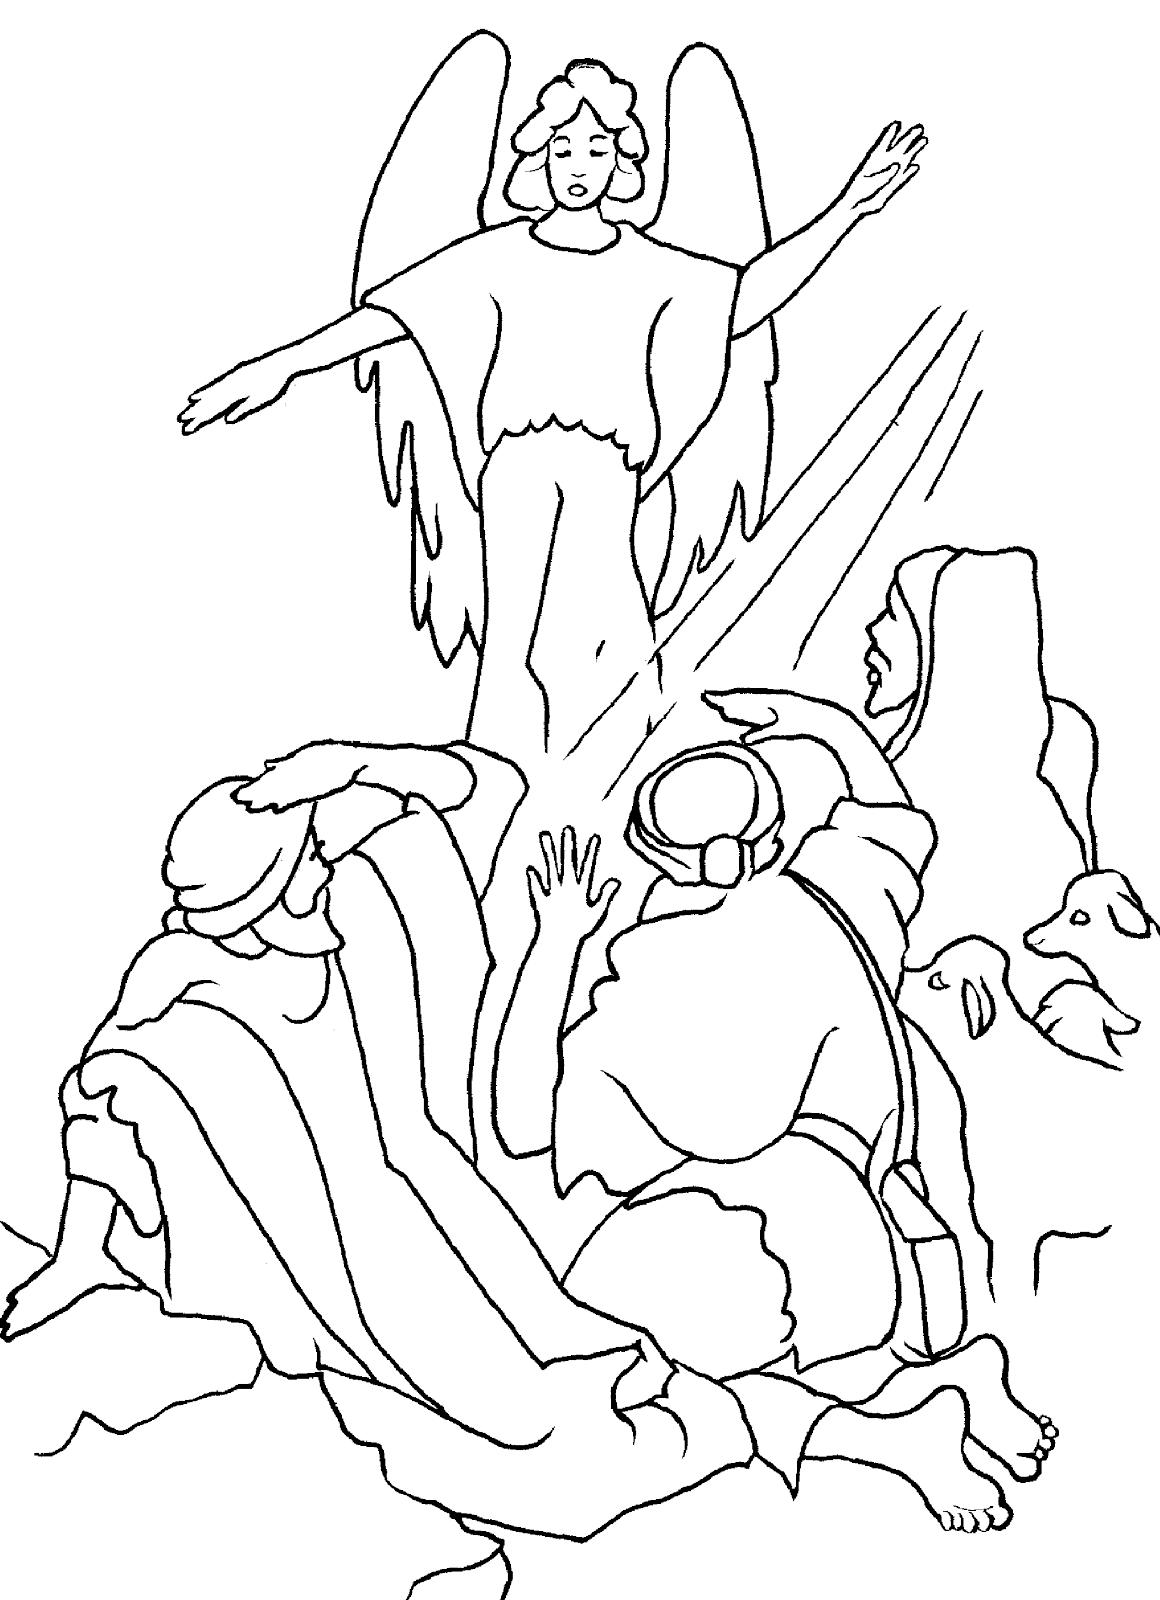 good samaritan coloring pages for - Good Samaritan Coloring Pages